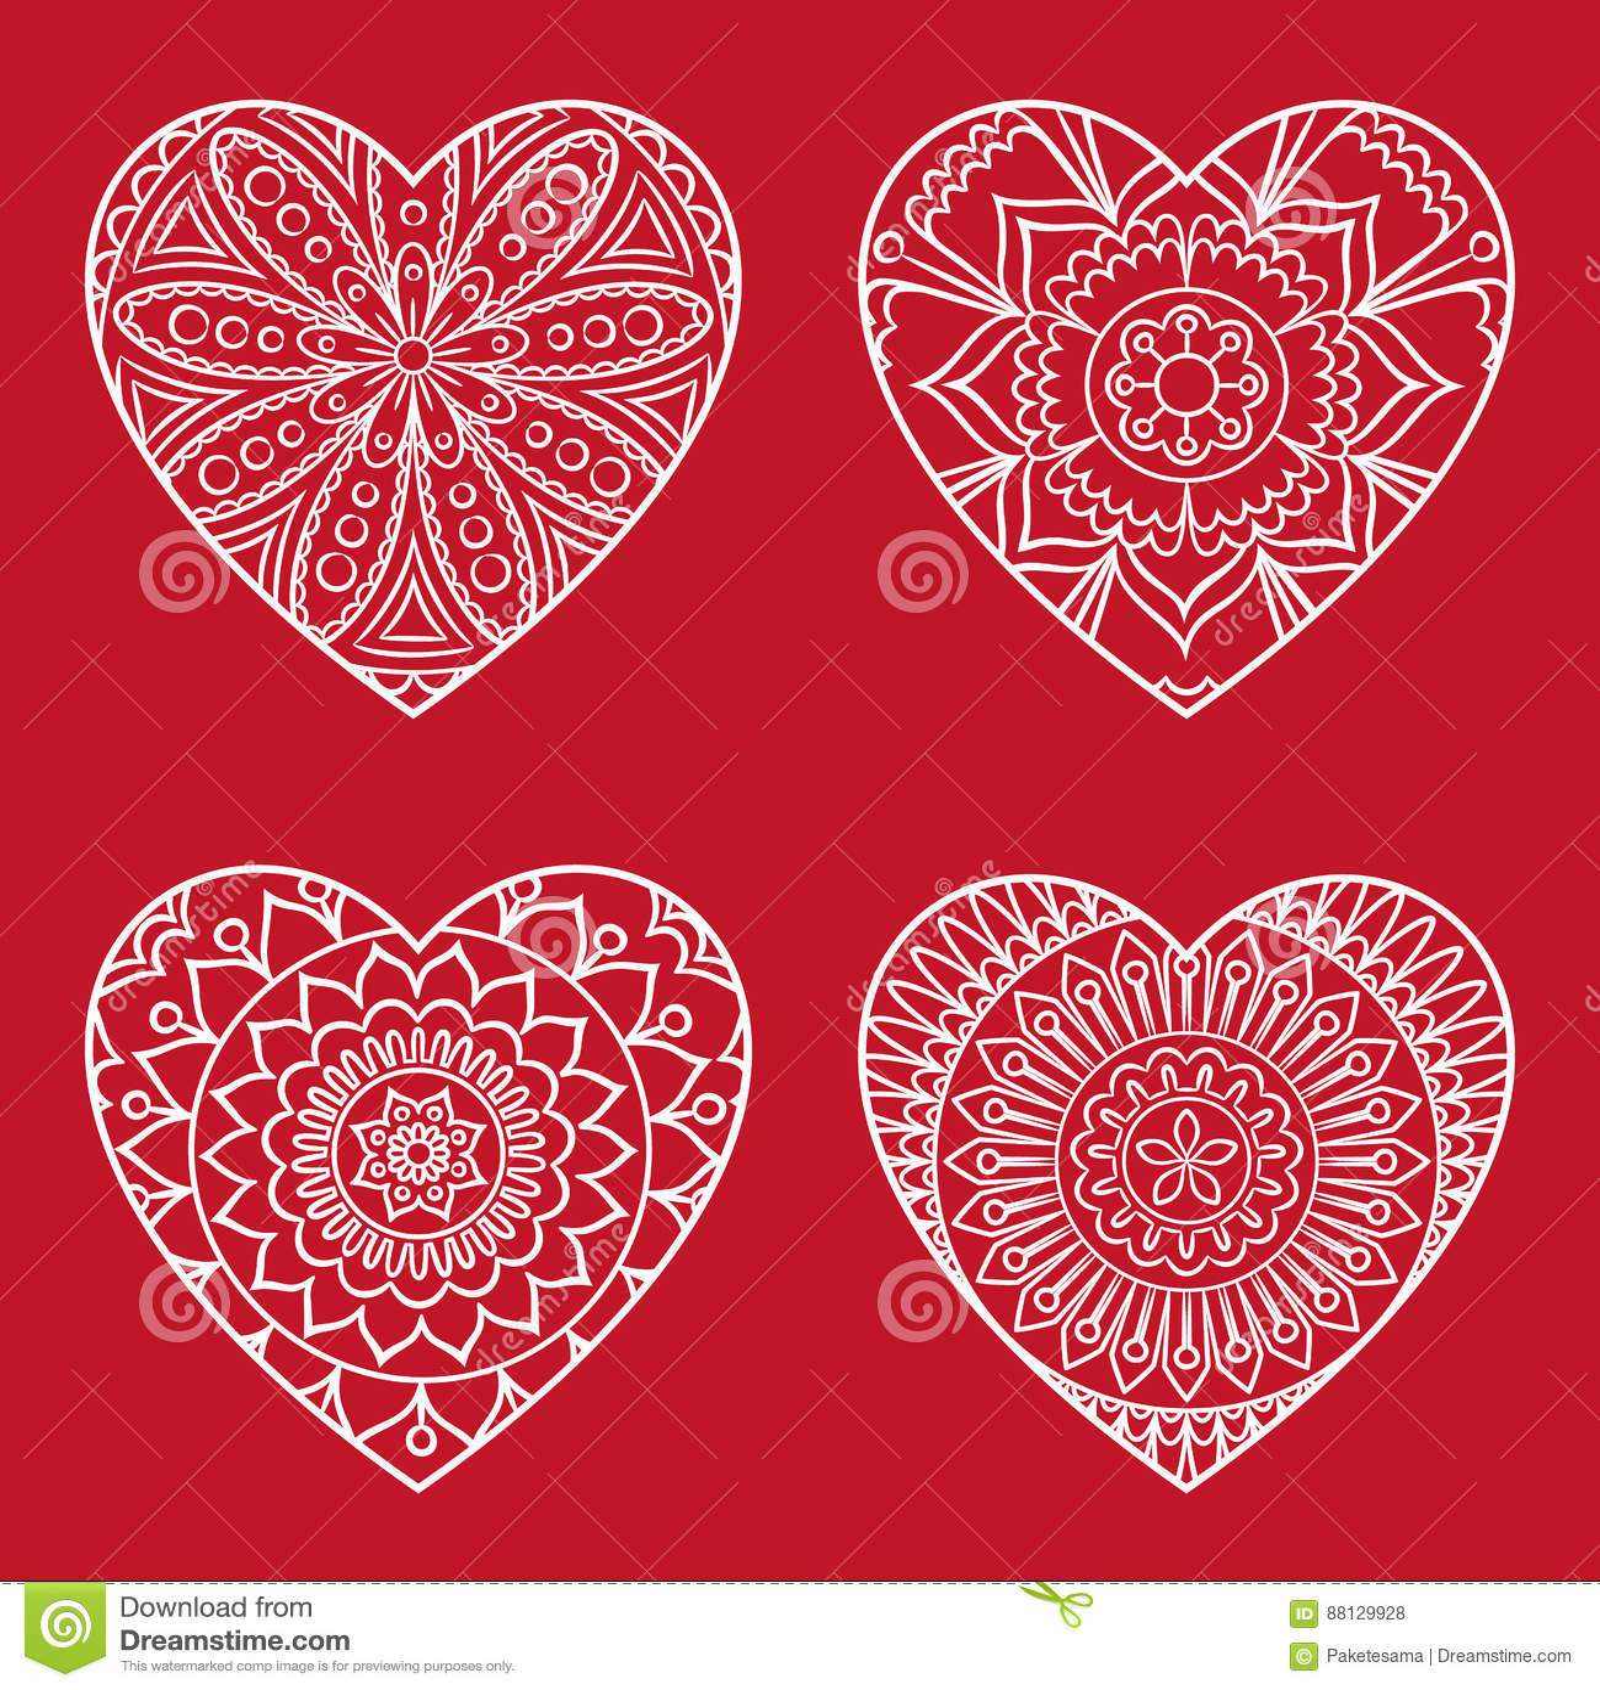 Coloriage Coeur Mariage.Carte De Coeur De Griffonnage Illustration De Vecteur